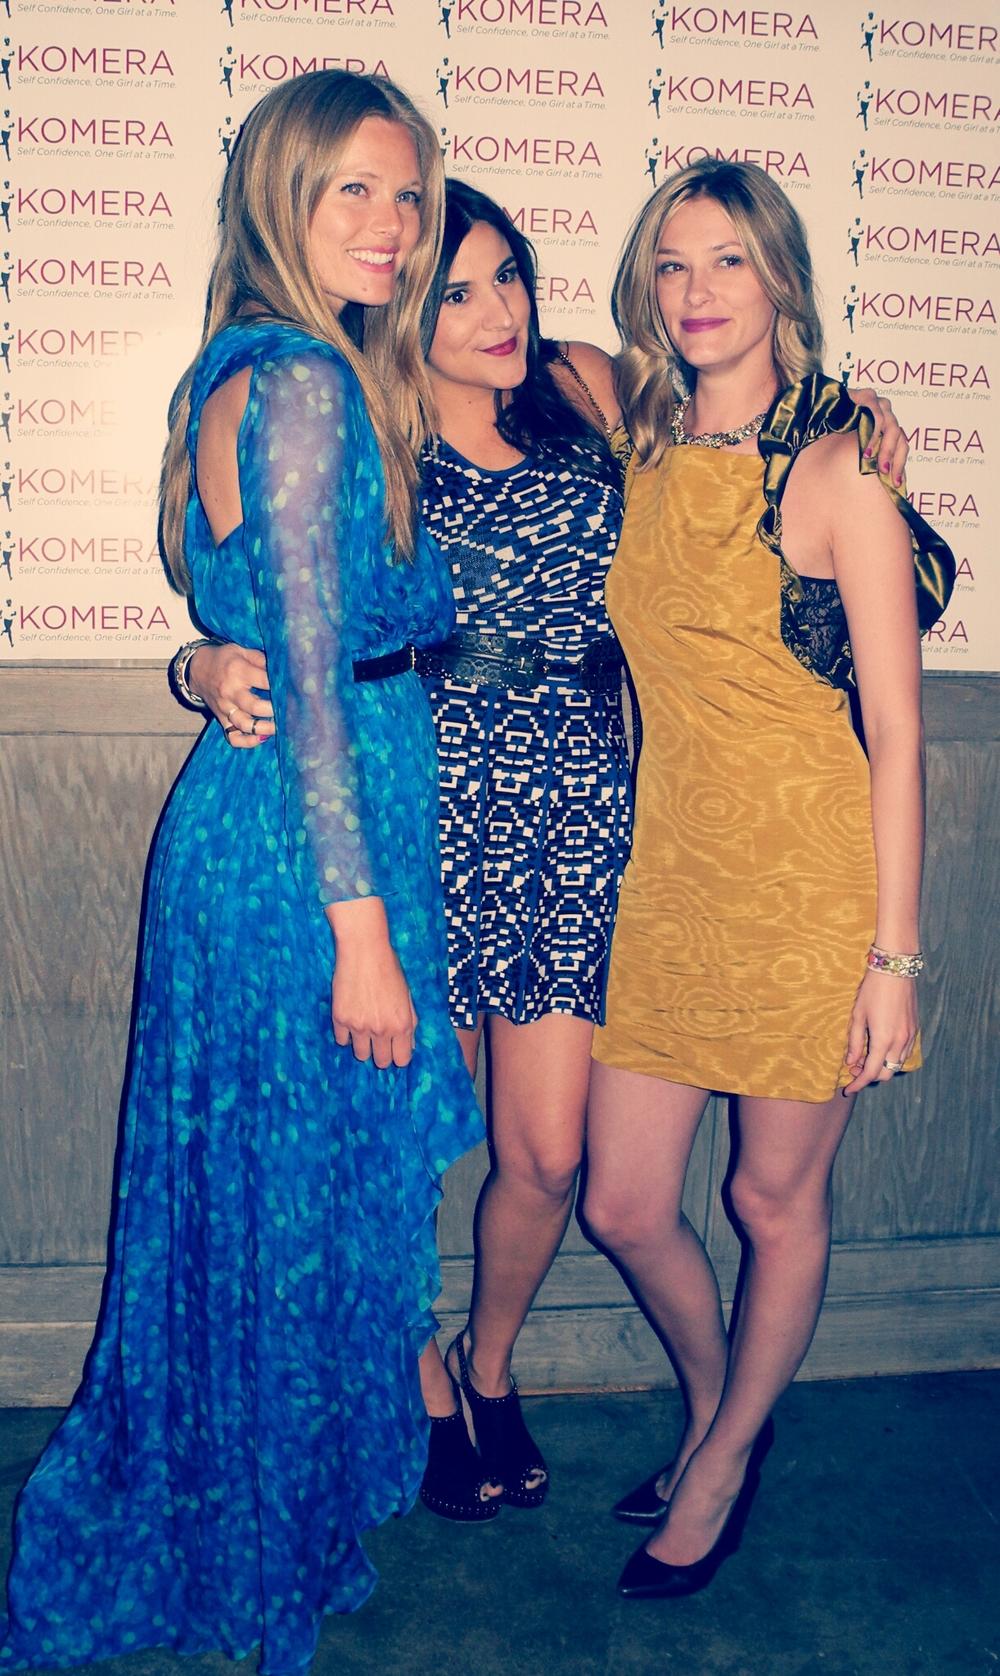 Peggy Miley,Karen Glaser (actress) XXX photos Stepanka Hanicincova,Jan Holden